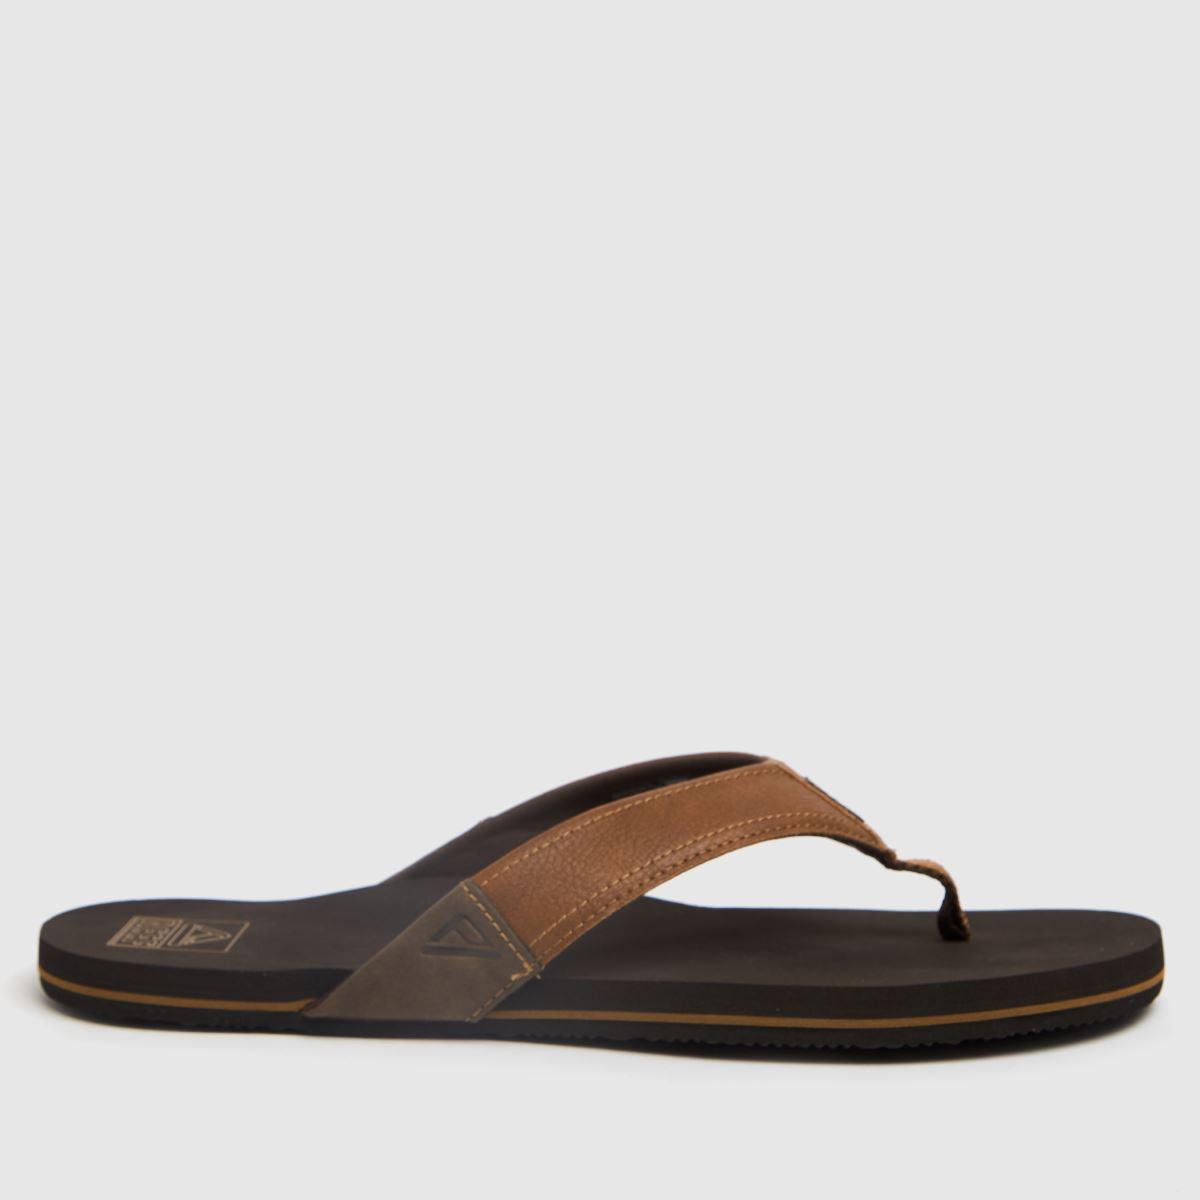 Reef Tan Newport Sandals